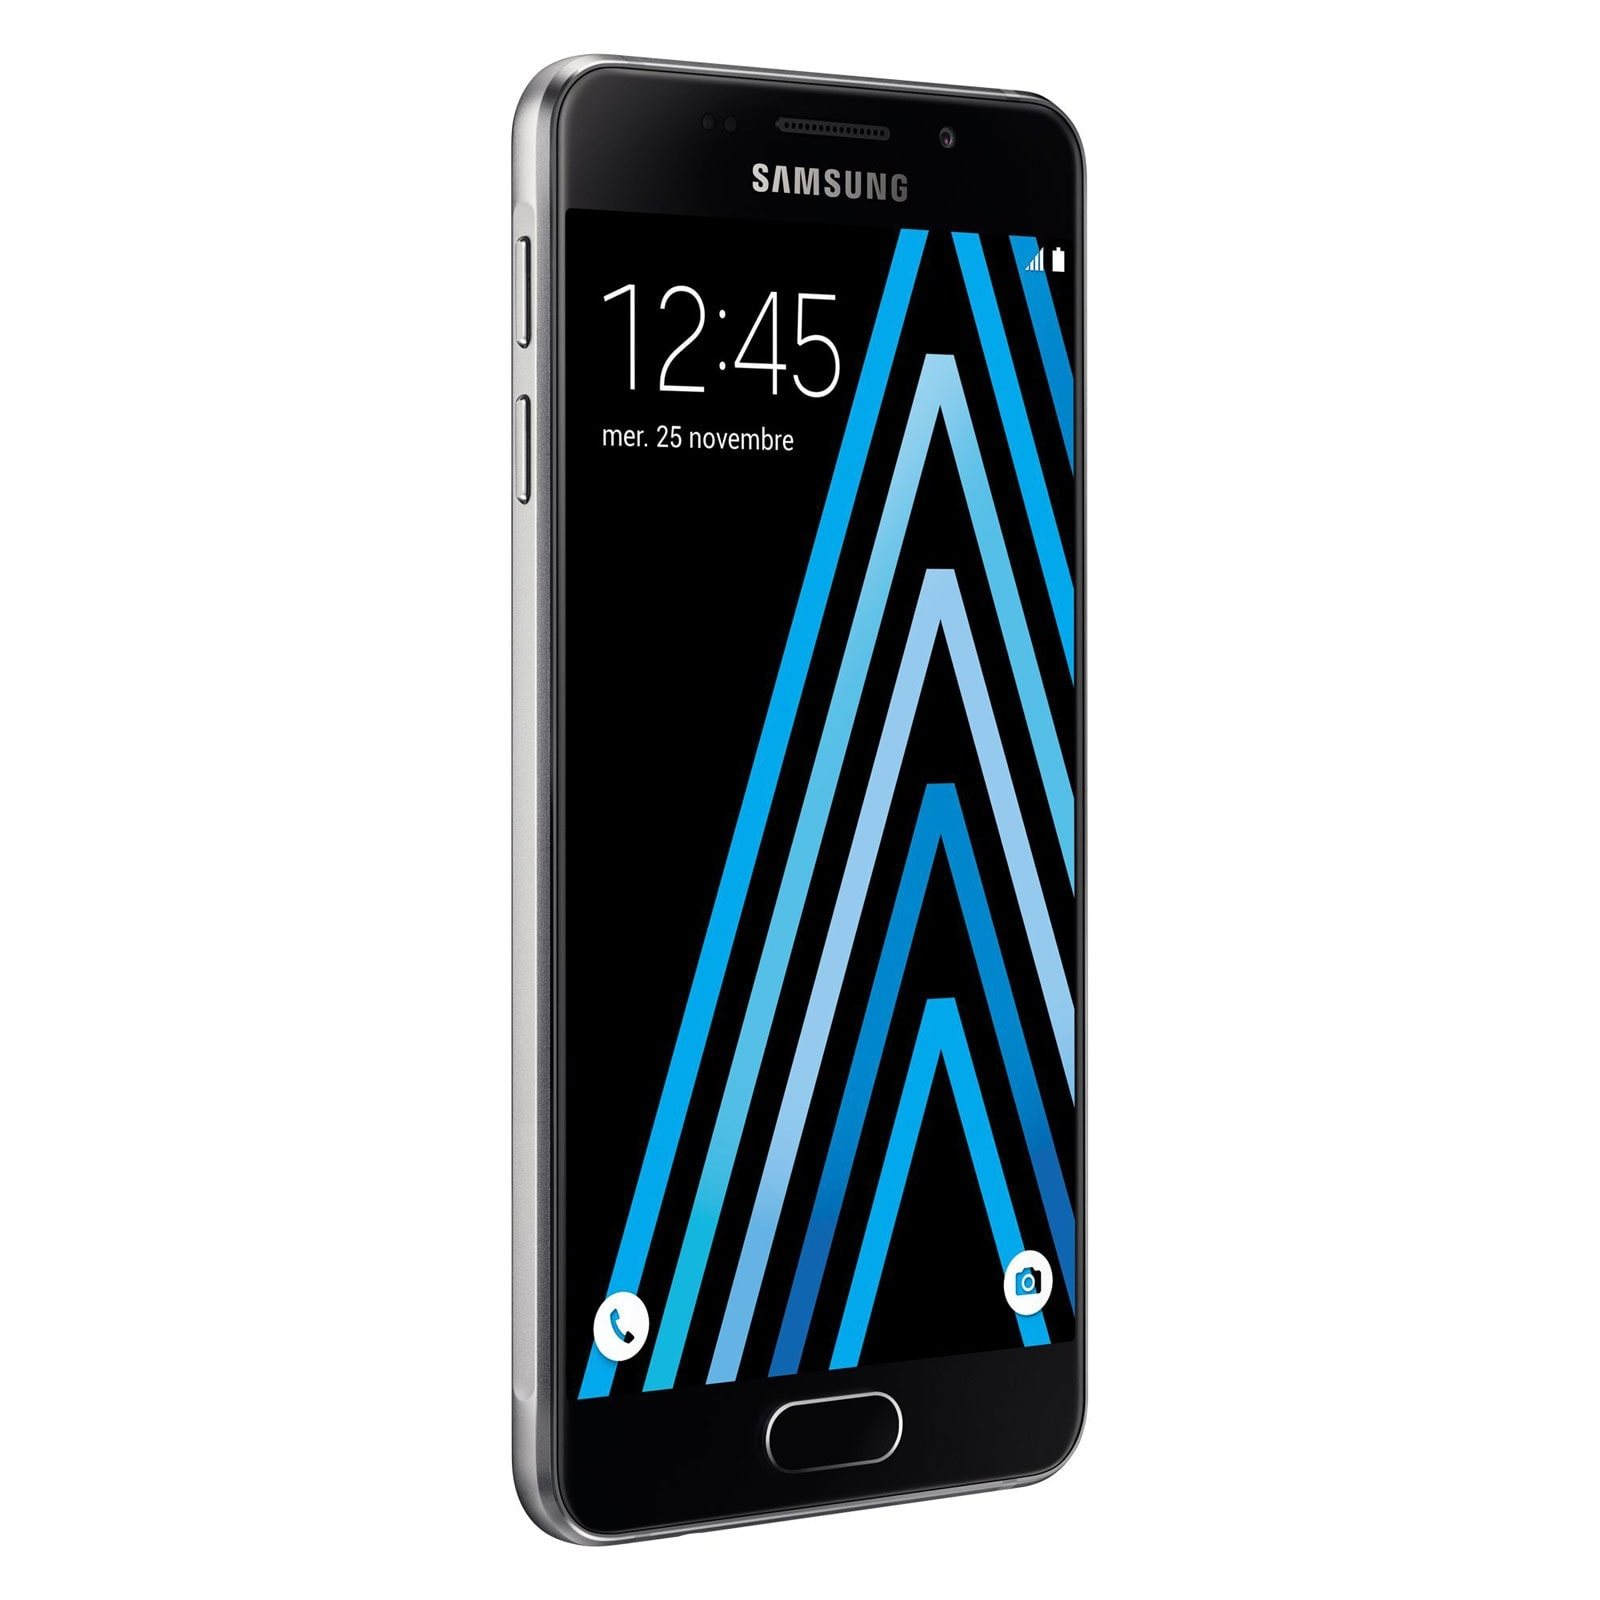 Samsung Galaxy A3 (2016) 16Go A310F Black - Téléphonie Samsung - 0